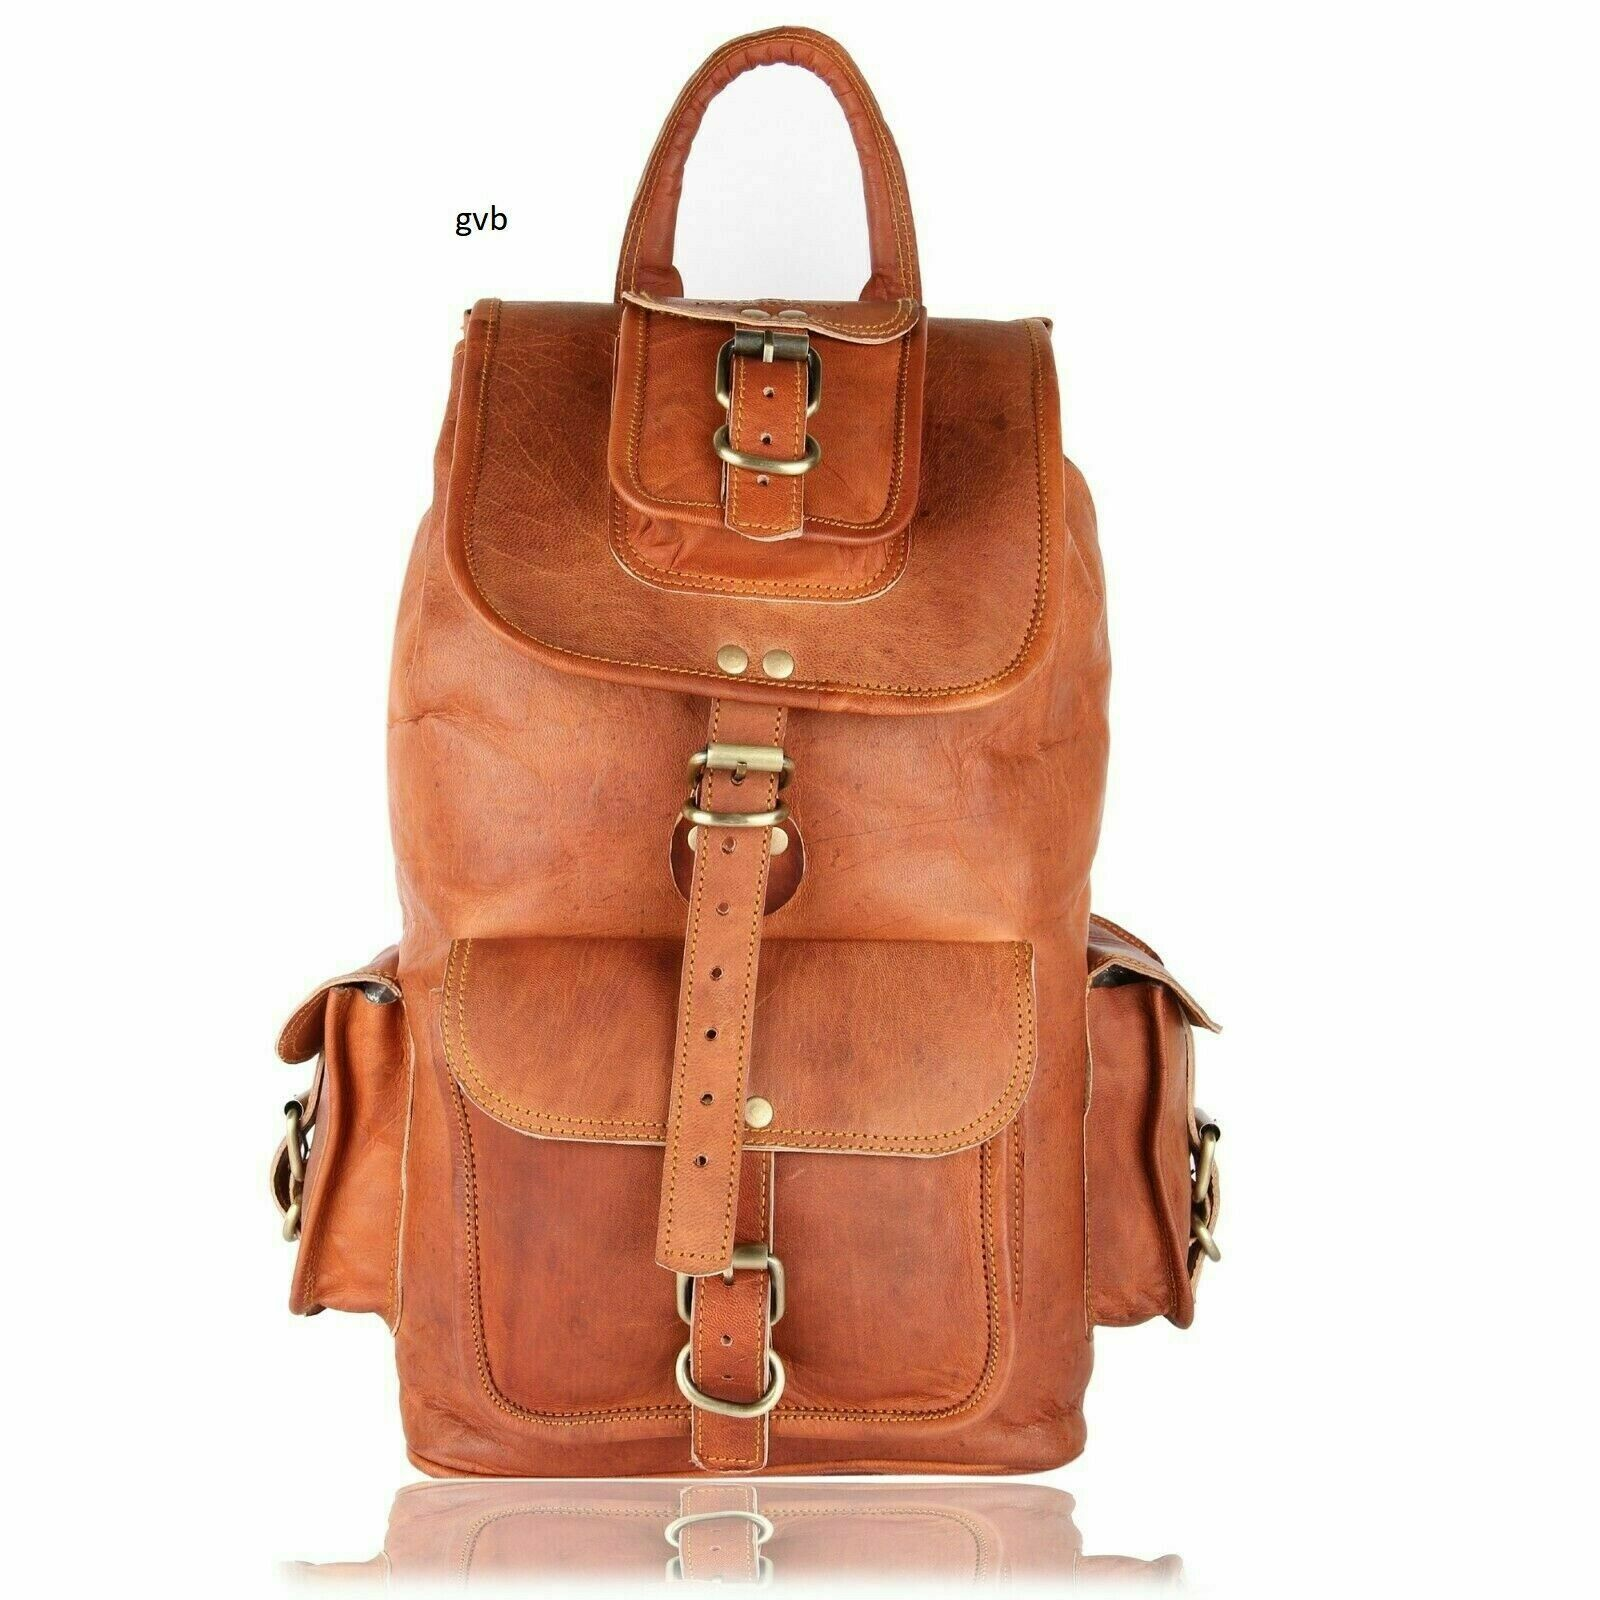 Real Goat Leather Travel Luggage Handmade Backapck Rucksack Hiking Vin... - s l1600